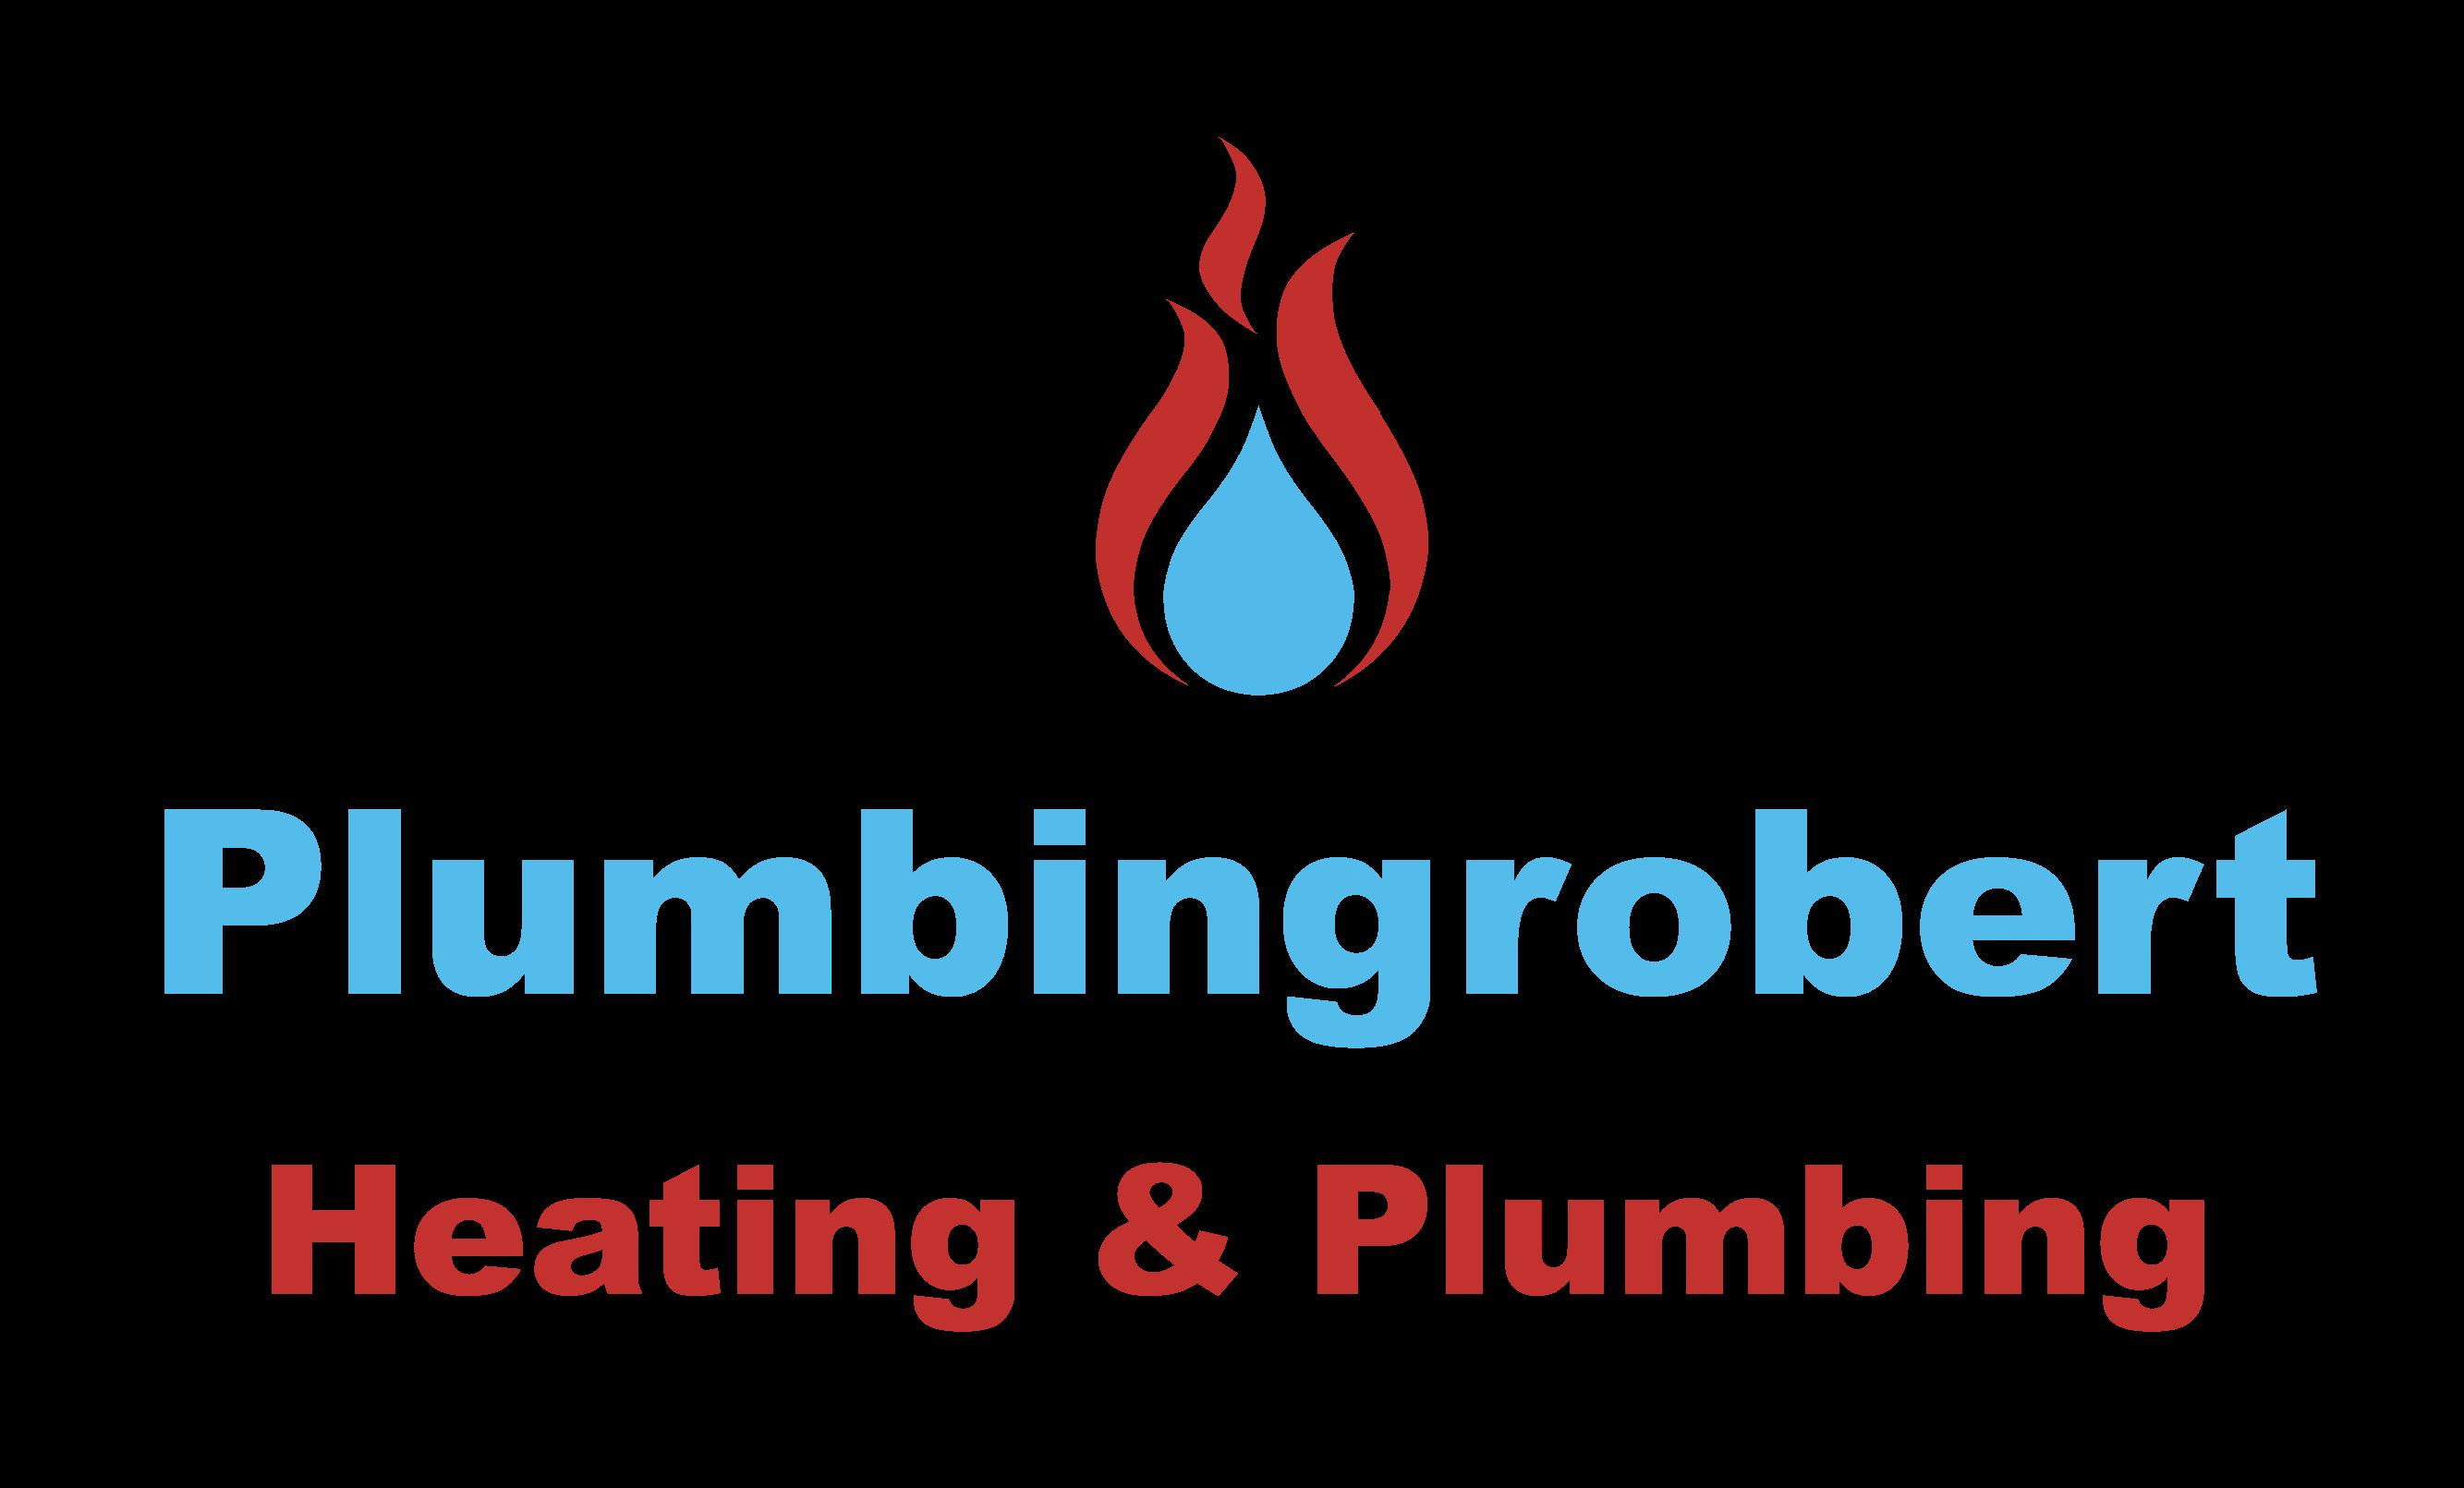 Plumbing Robert Verified Logo